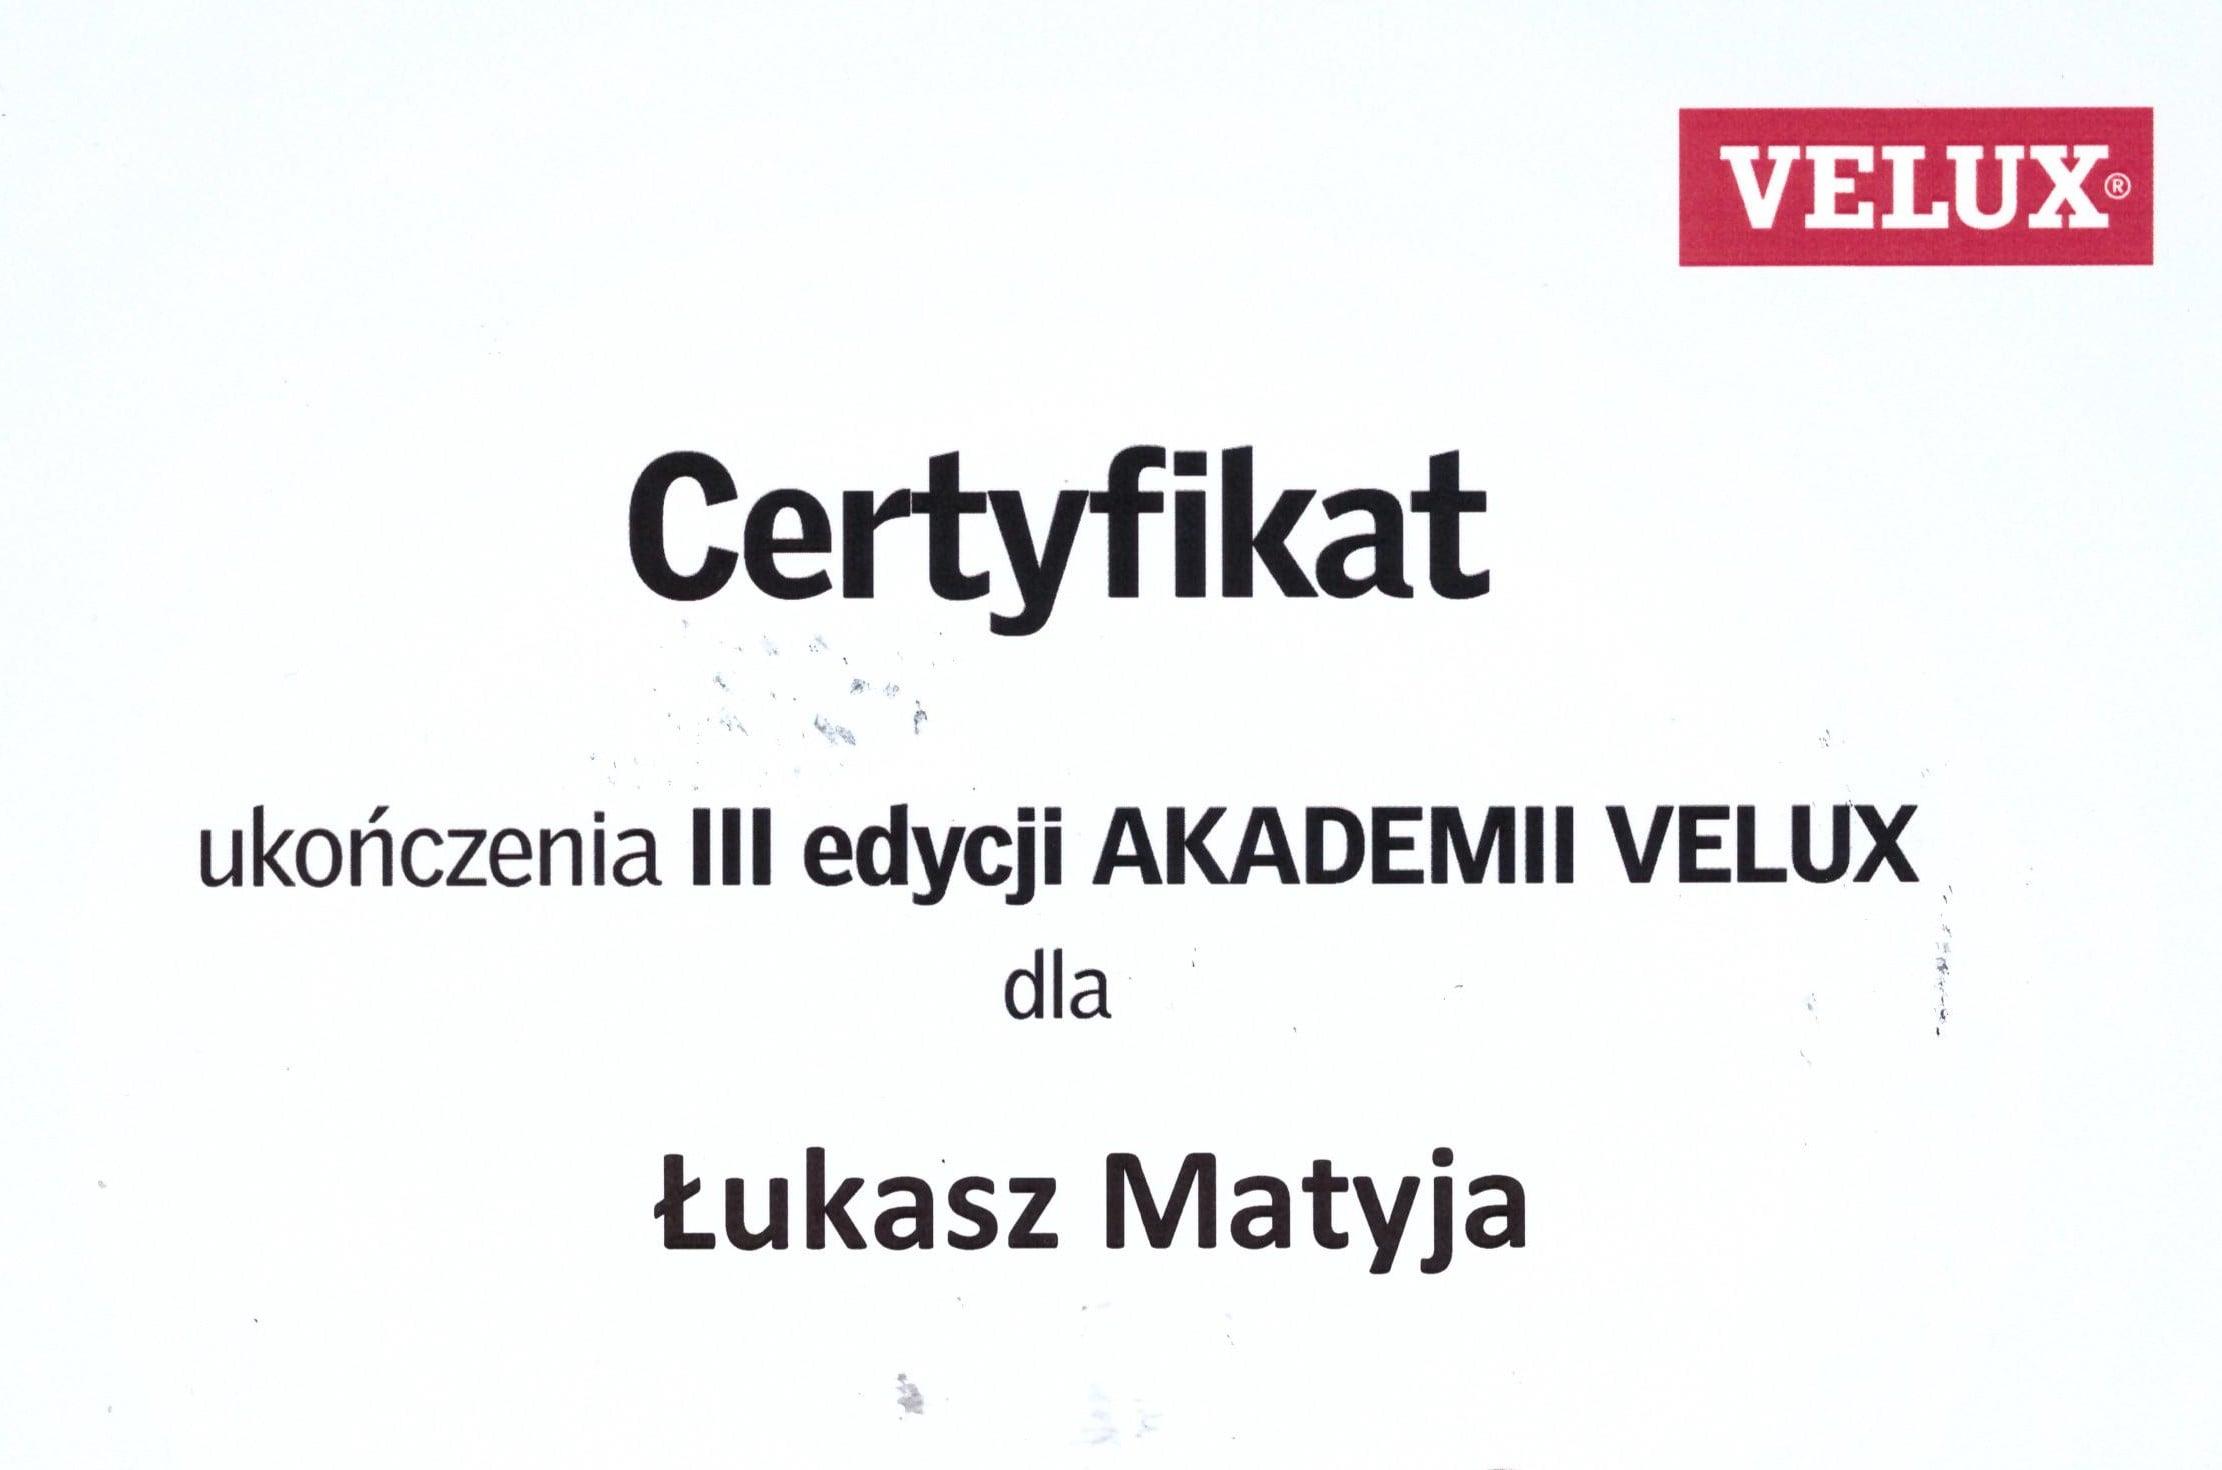 Certyfikat - Łukasz — kopia